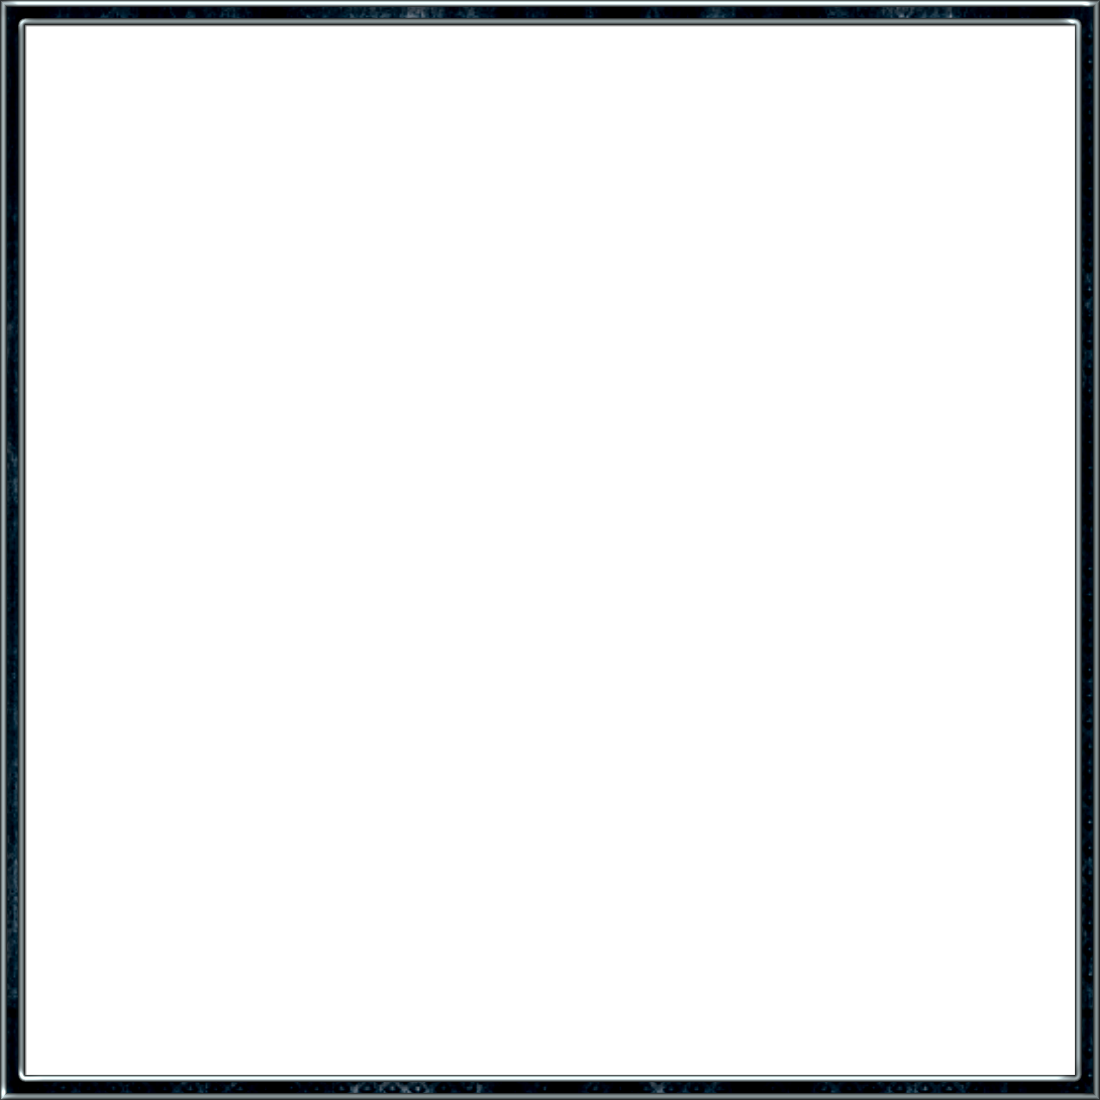 square frame png image 25167